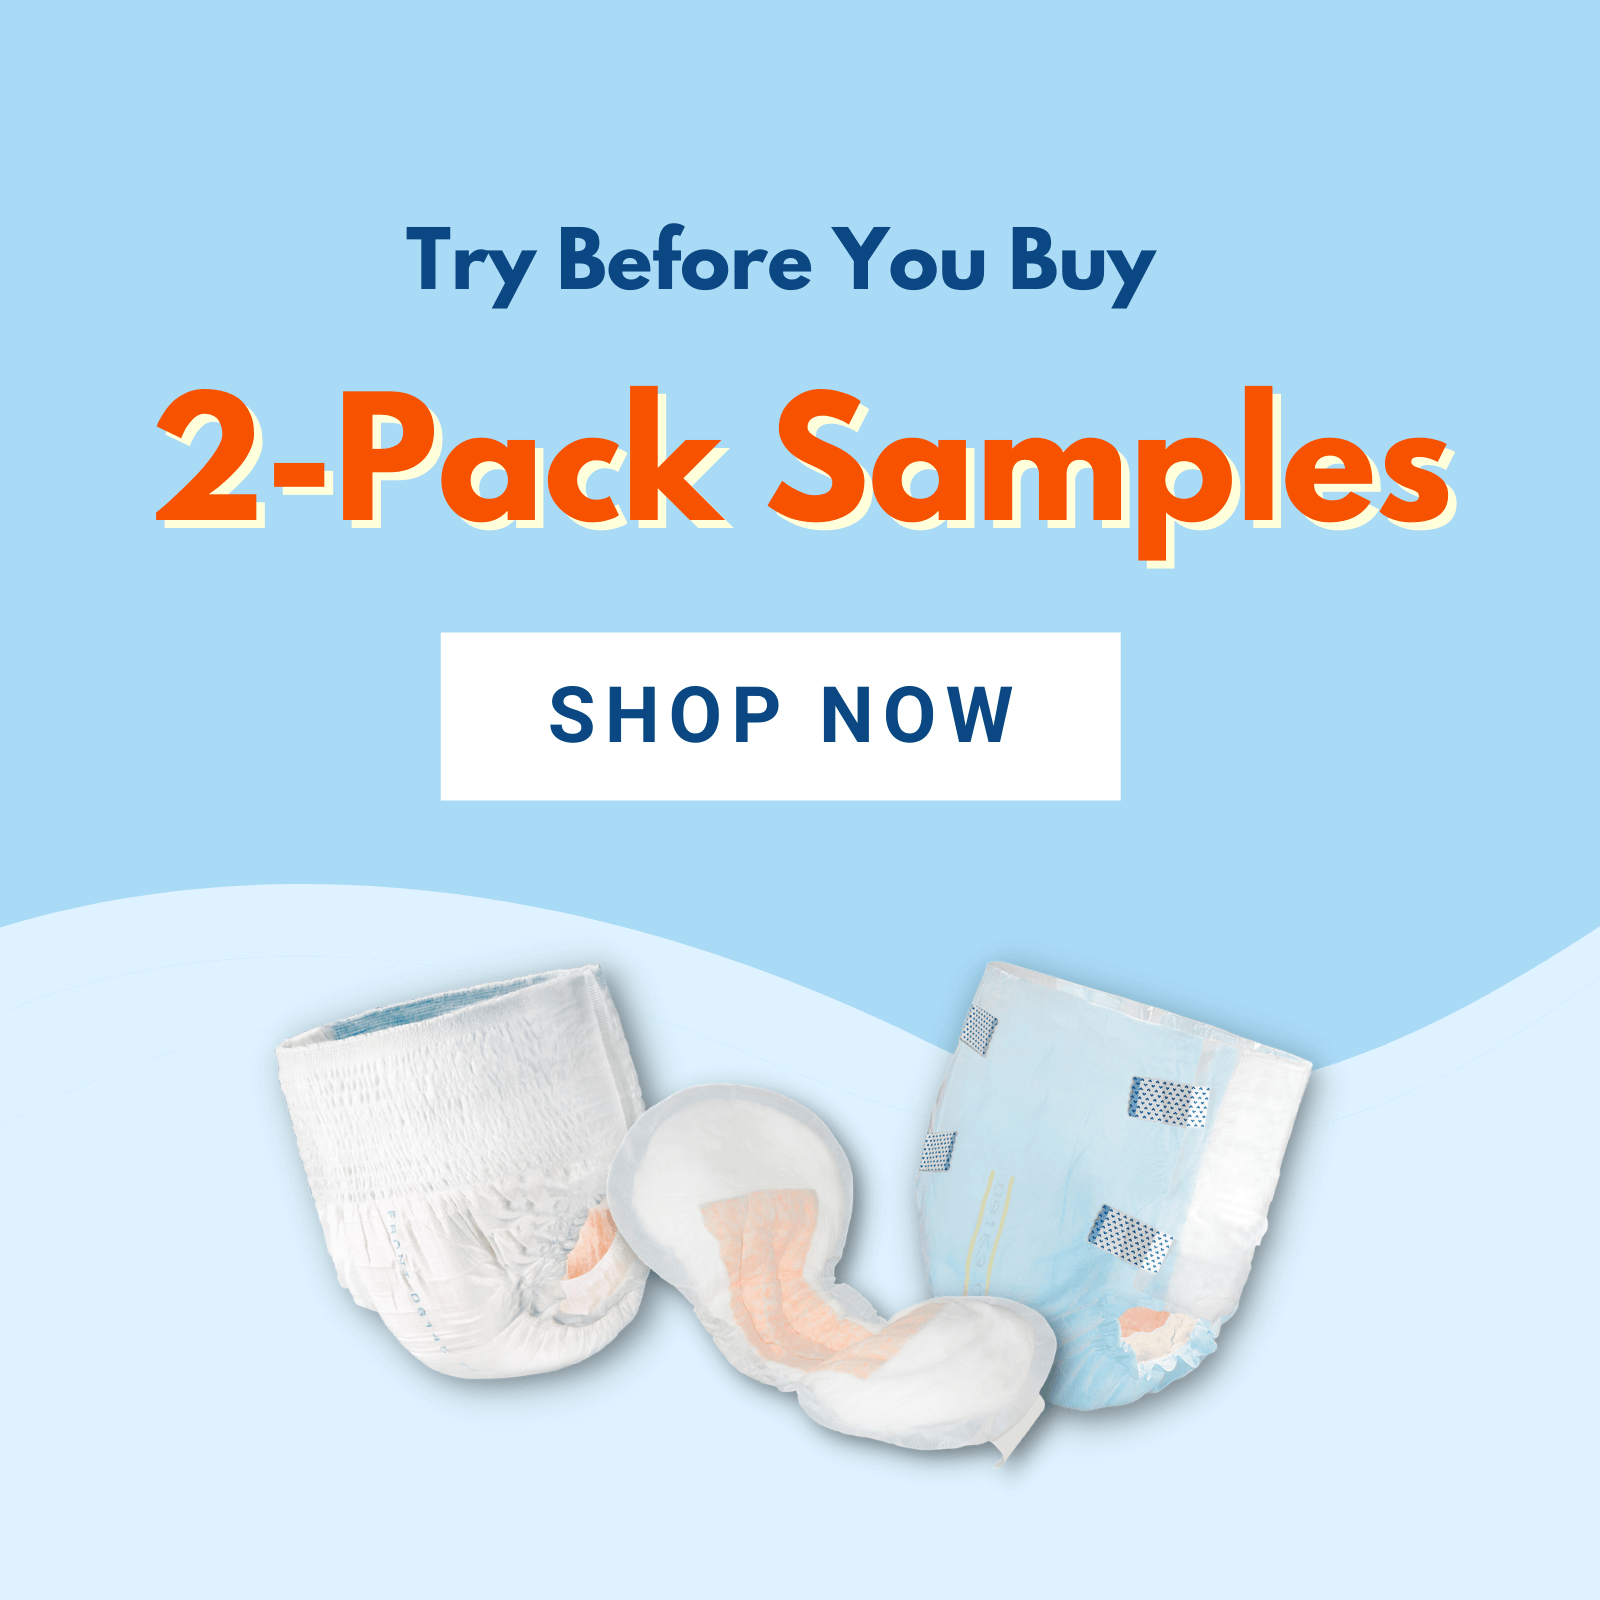 2-Pack Samples